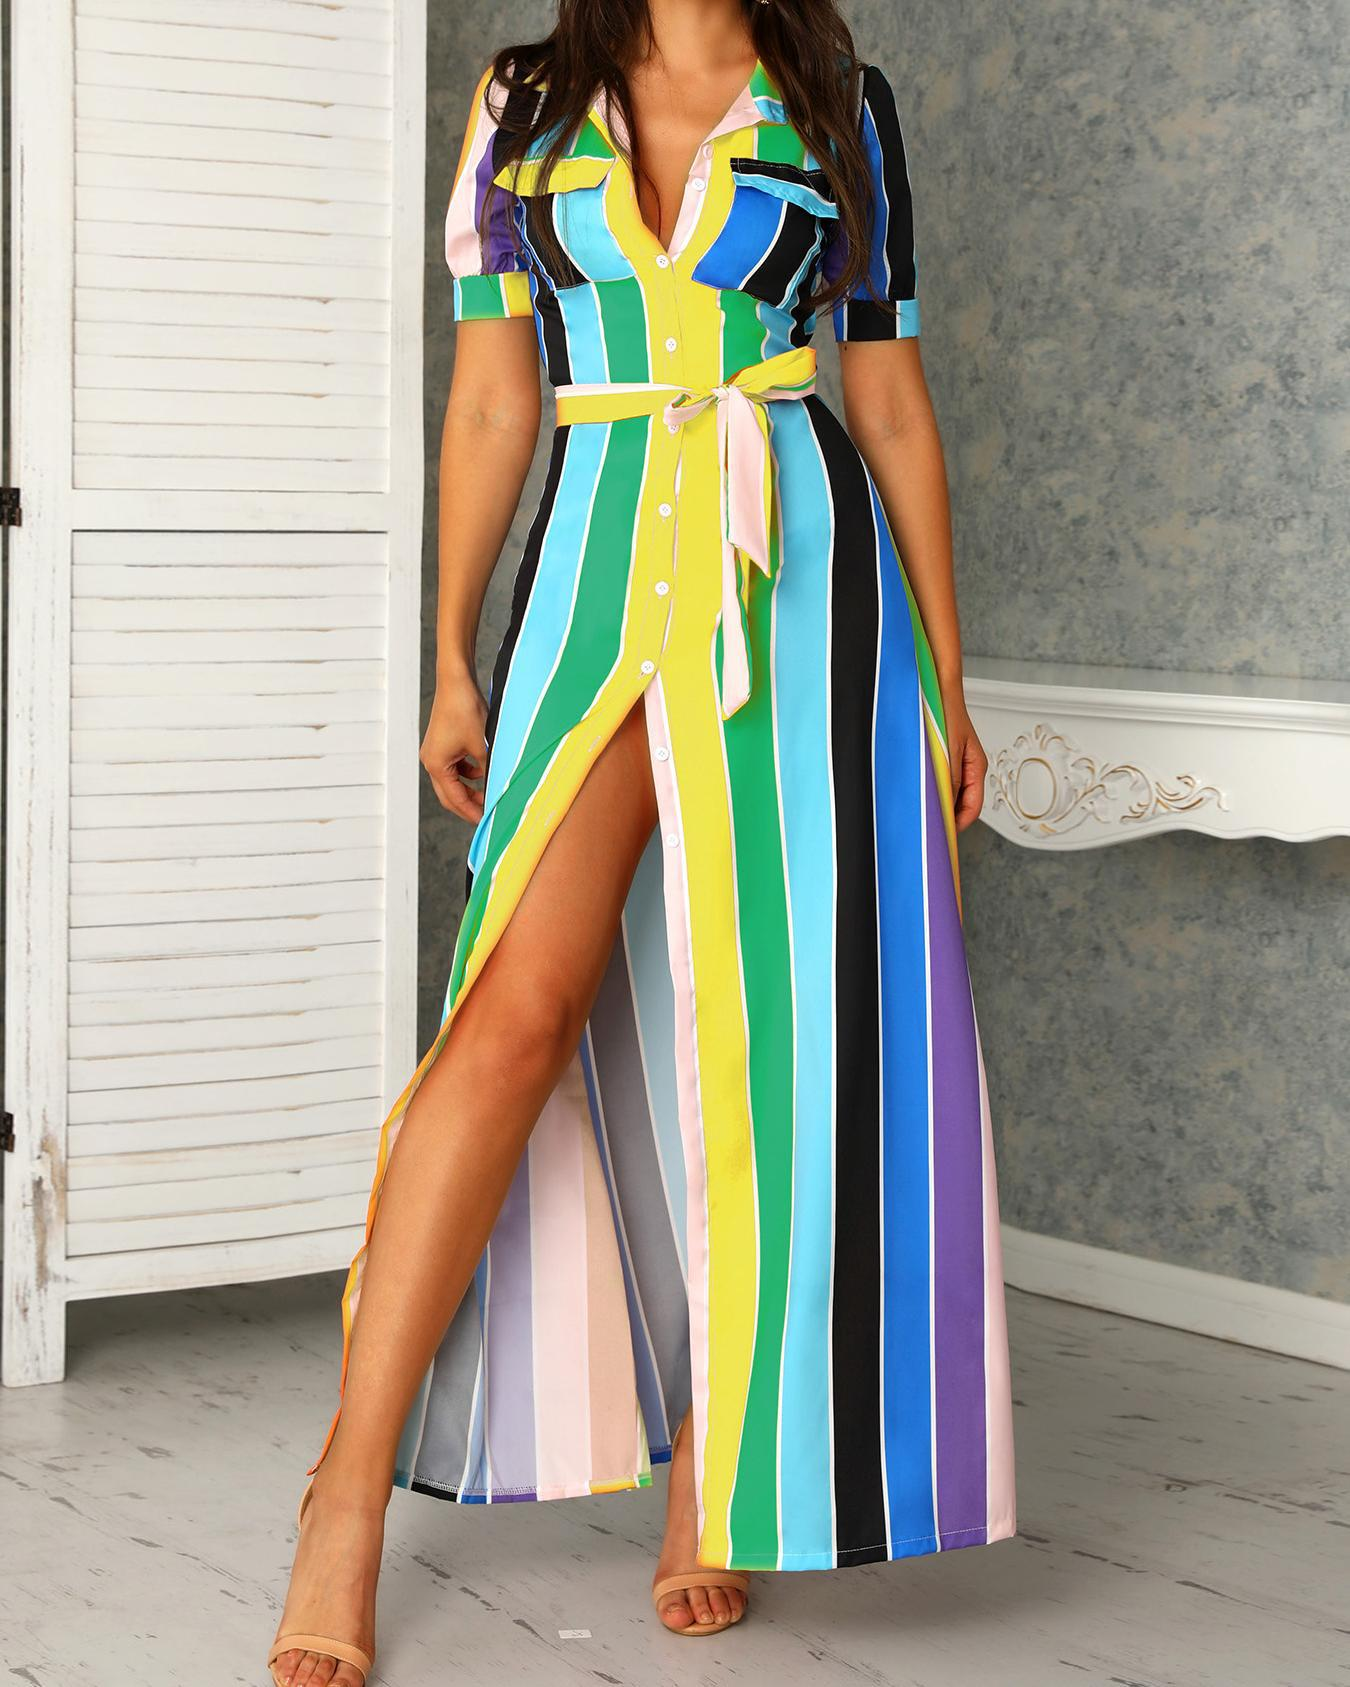 joyshoetique / Rainbow Color Striped Buttoned Shirt Maxi Dress